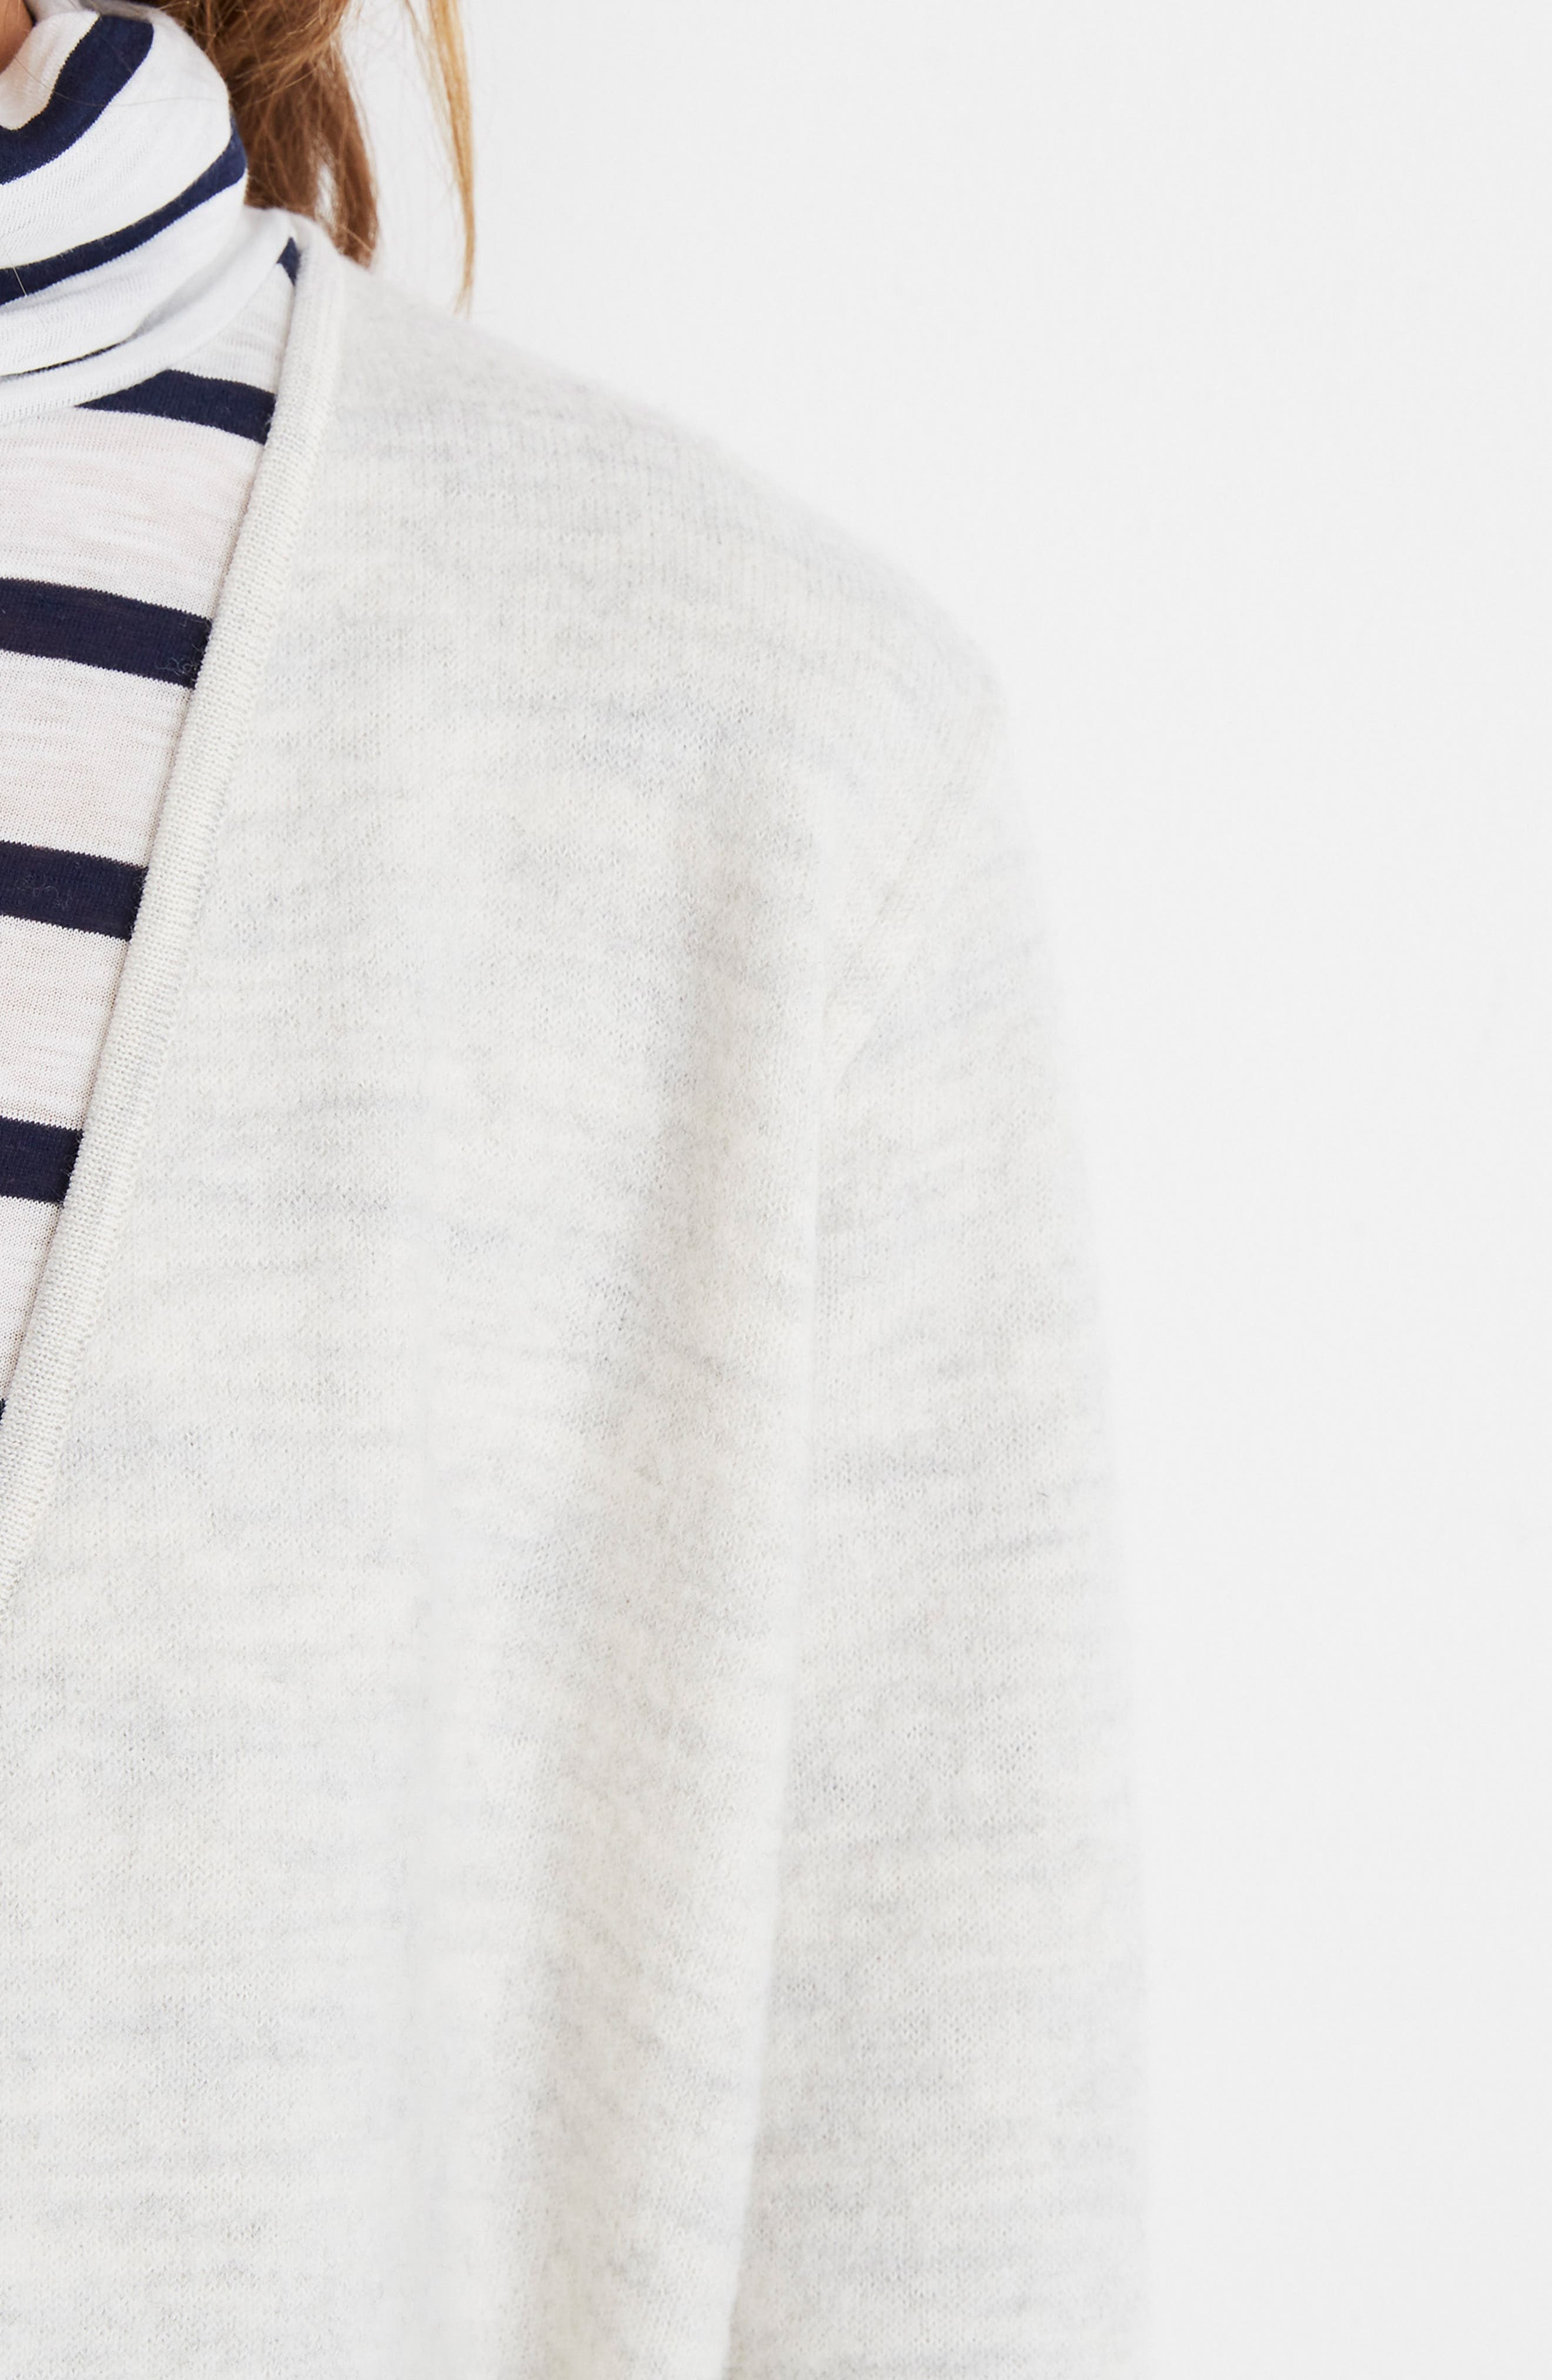 Lombard Sweater Coat,                             Alternate thumbnail 6, color,                             020